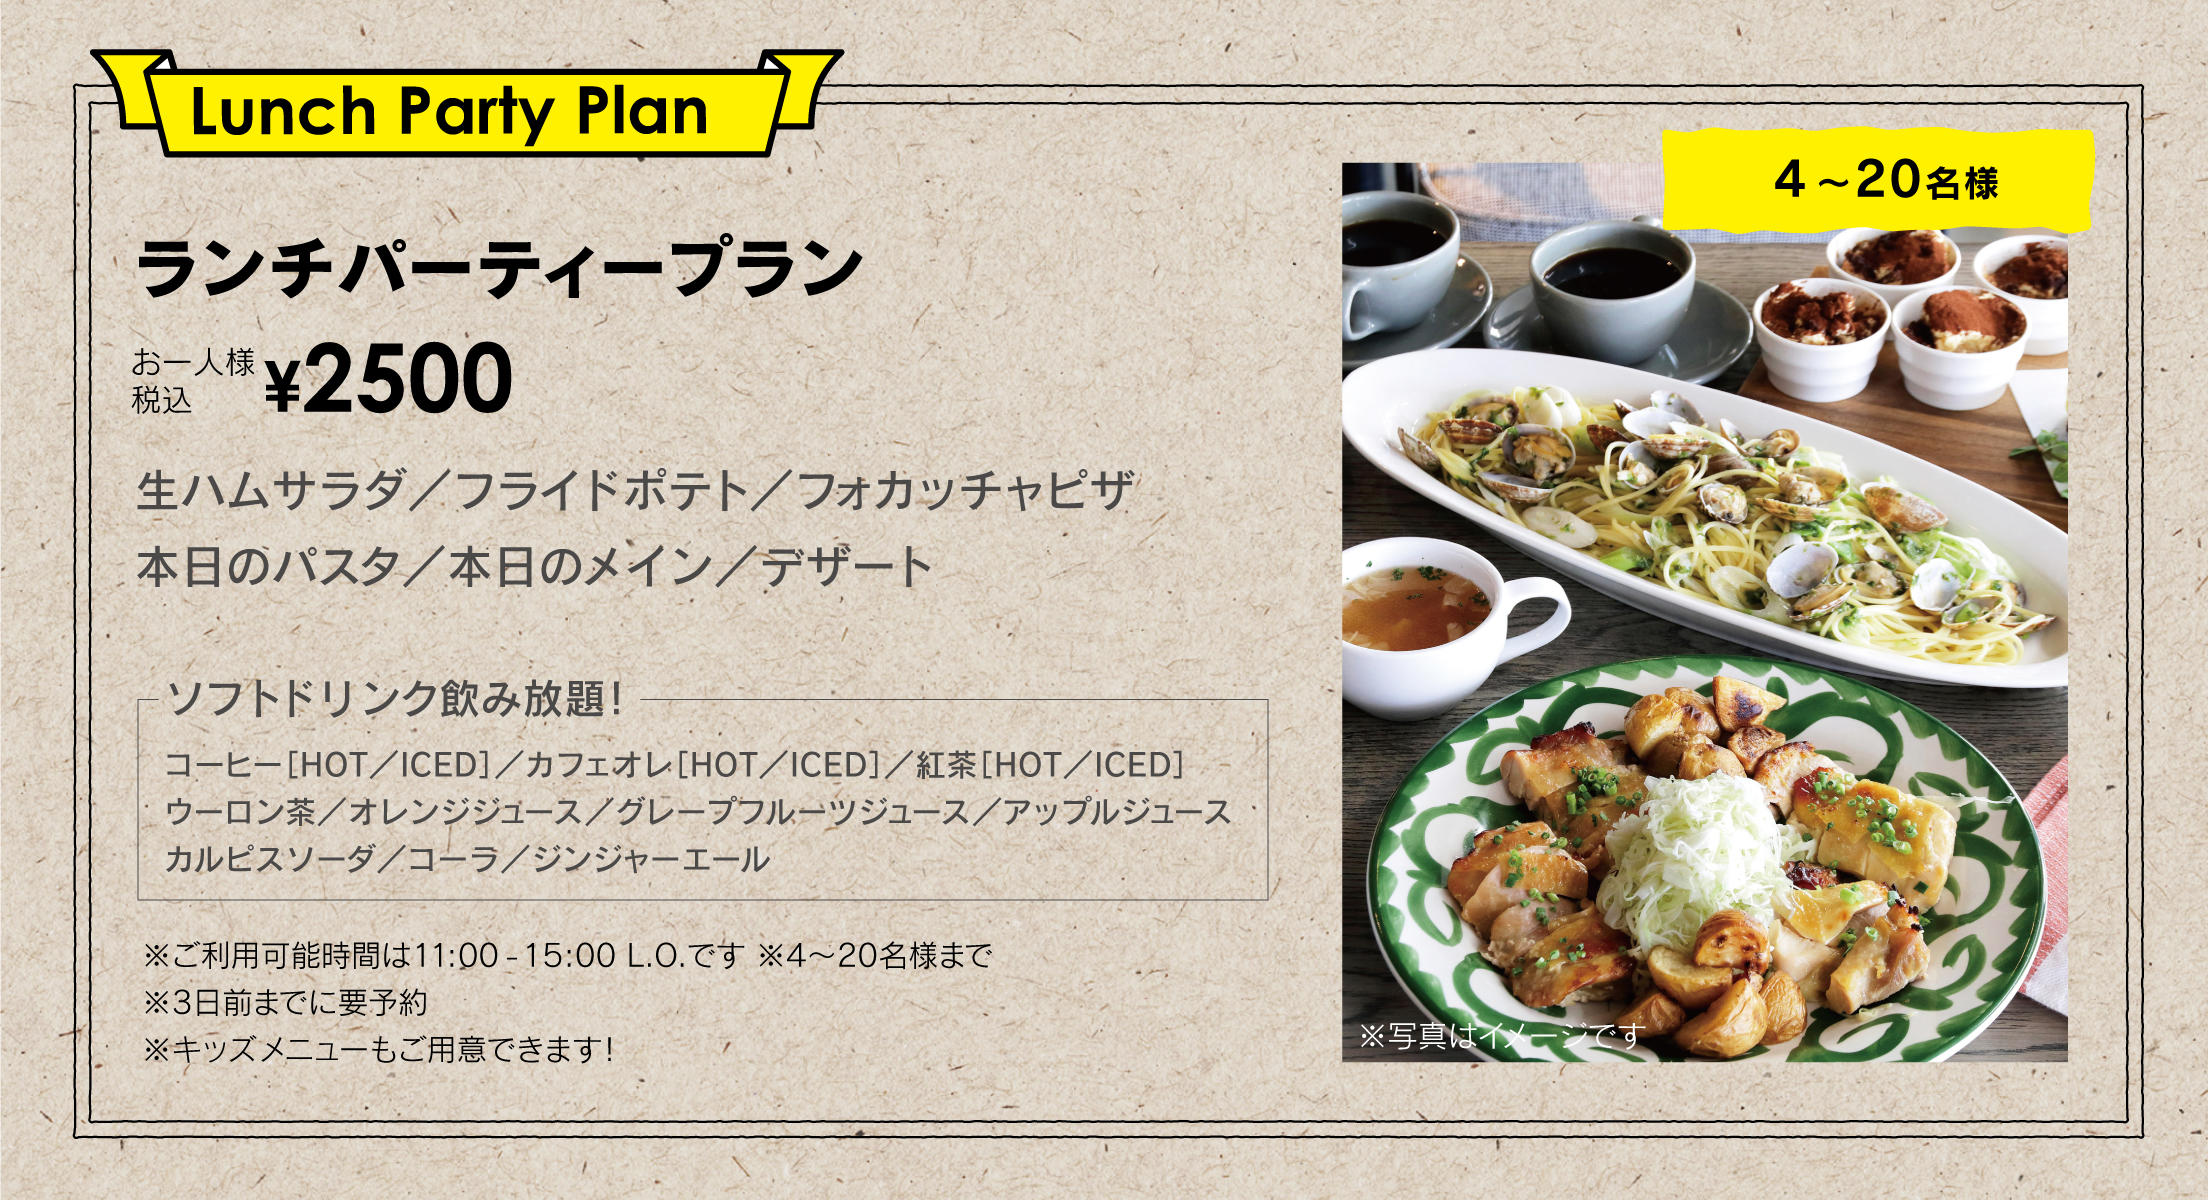 mu_19701_lunchplan_main.jpg